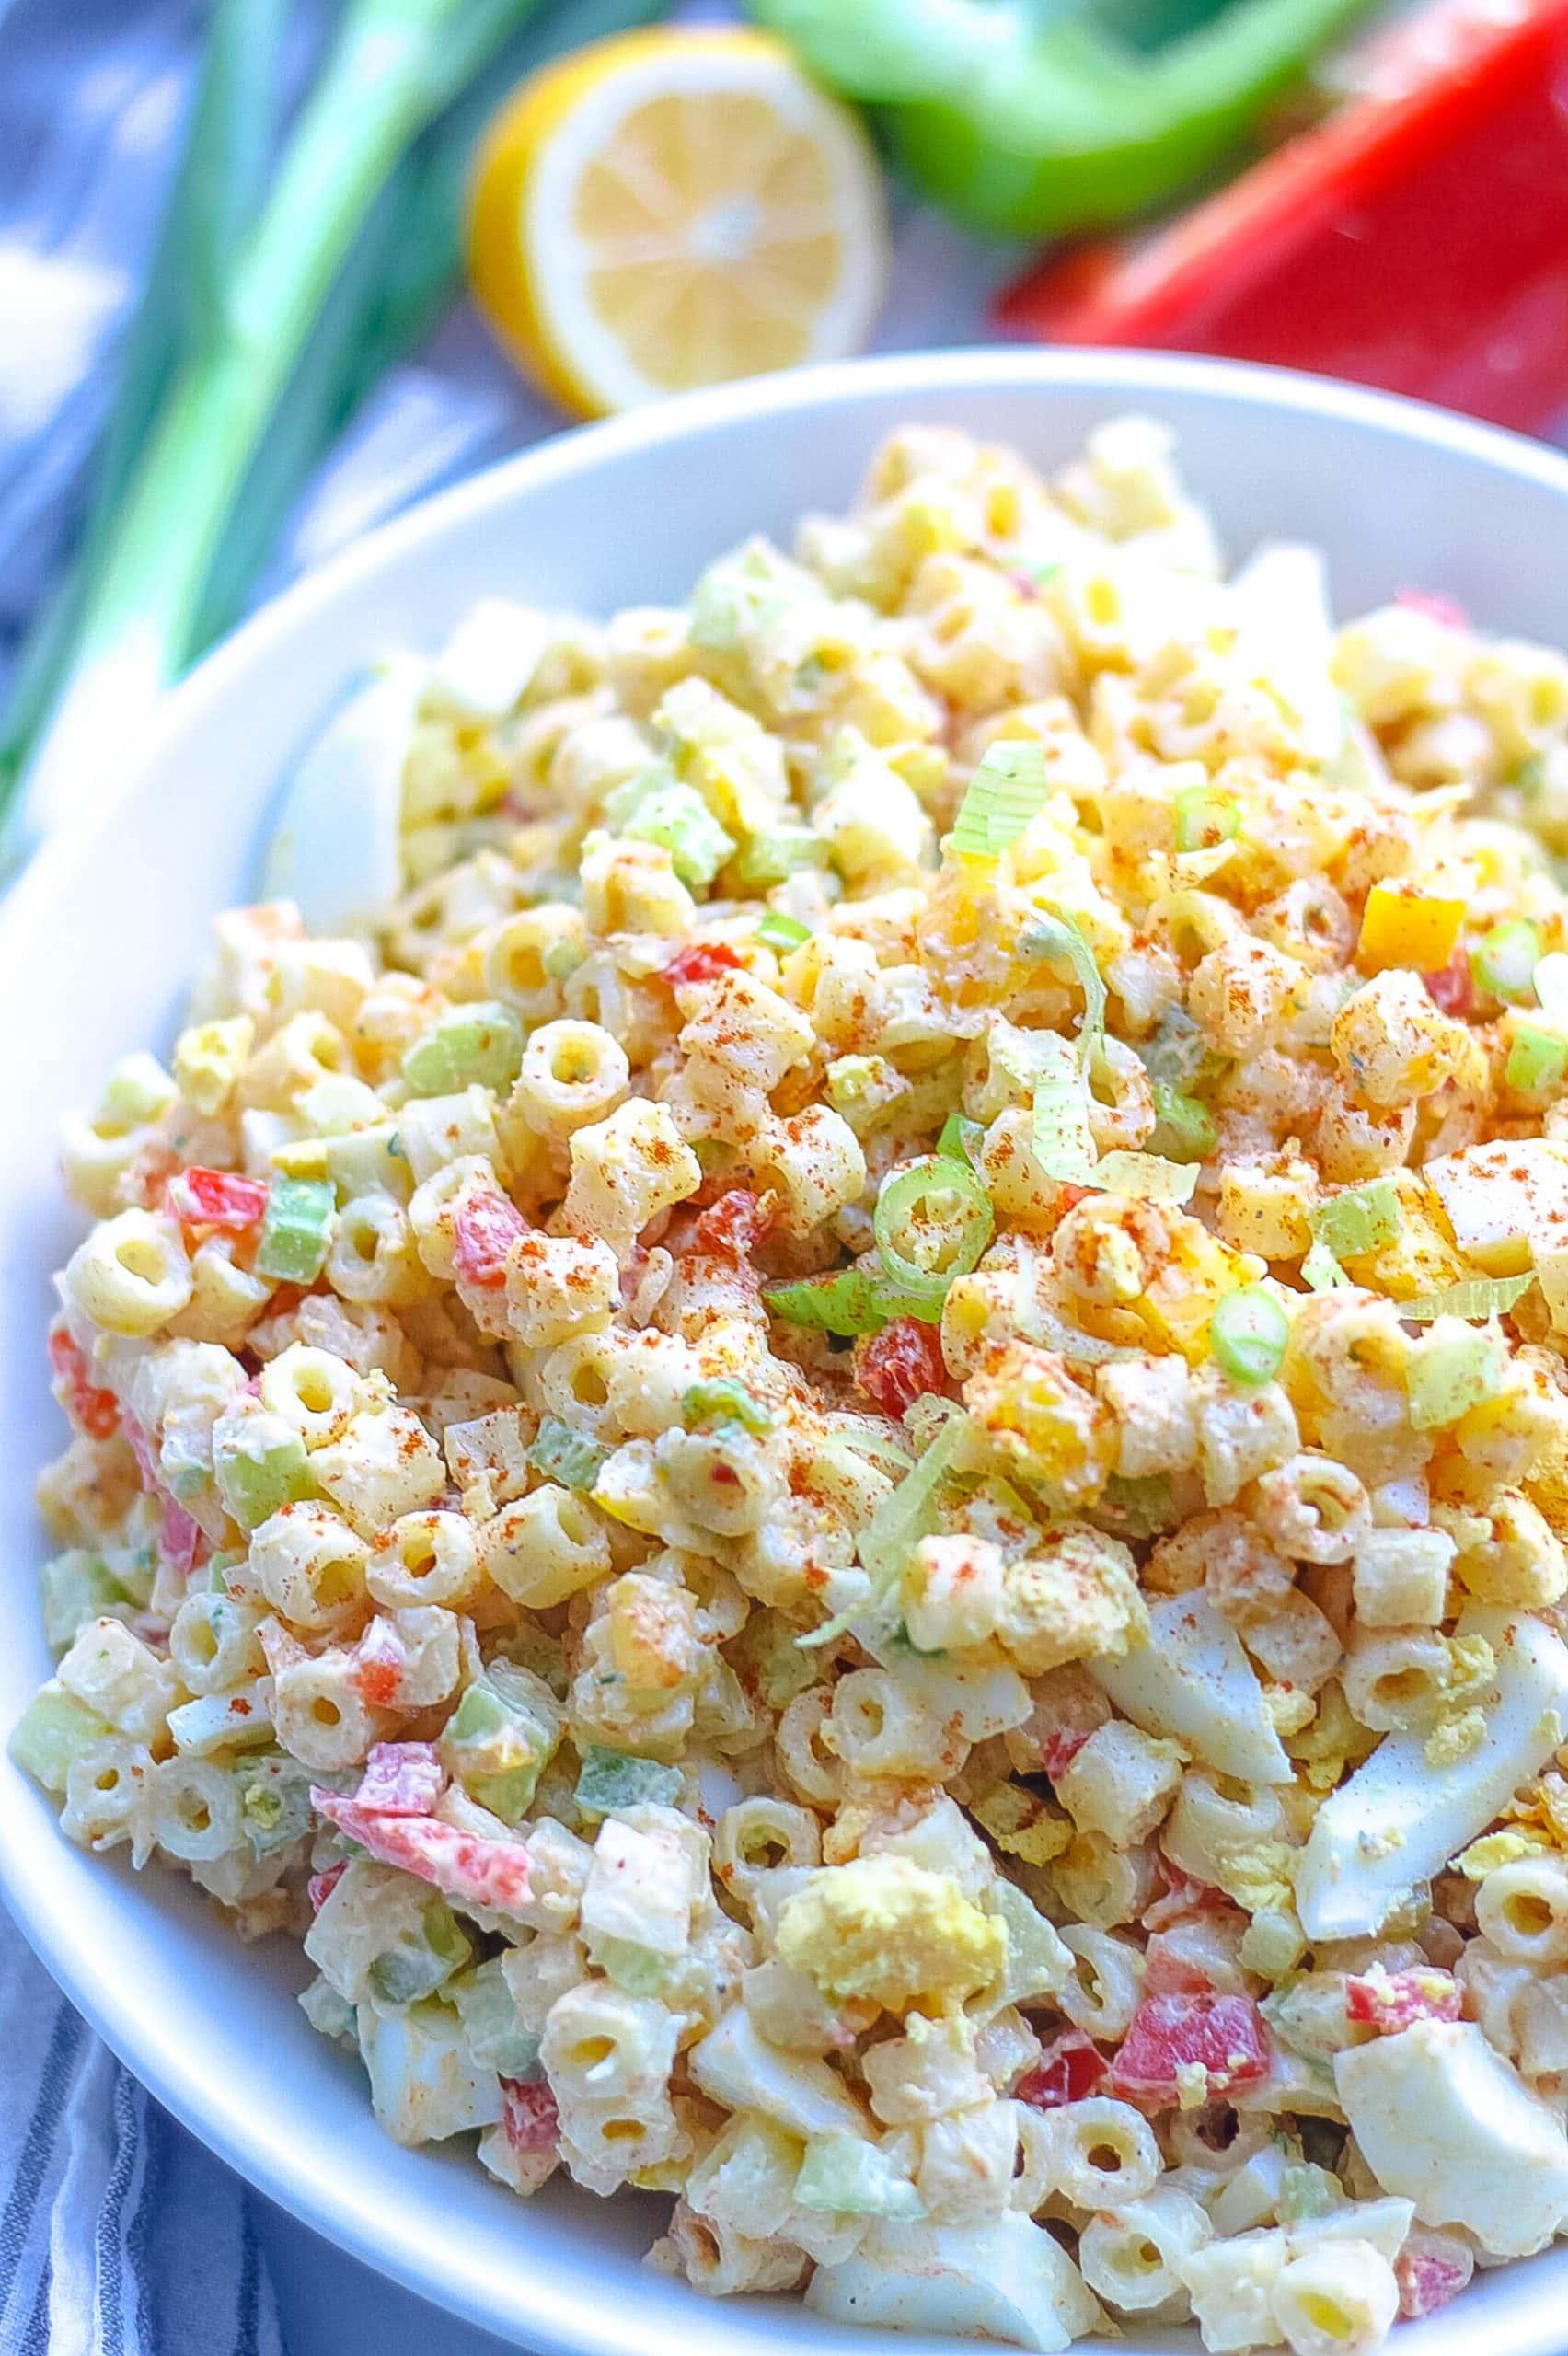 Macaroni Salad with hard boiled eggs